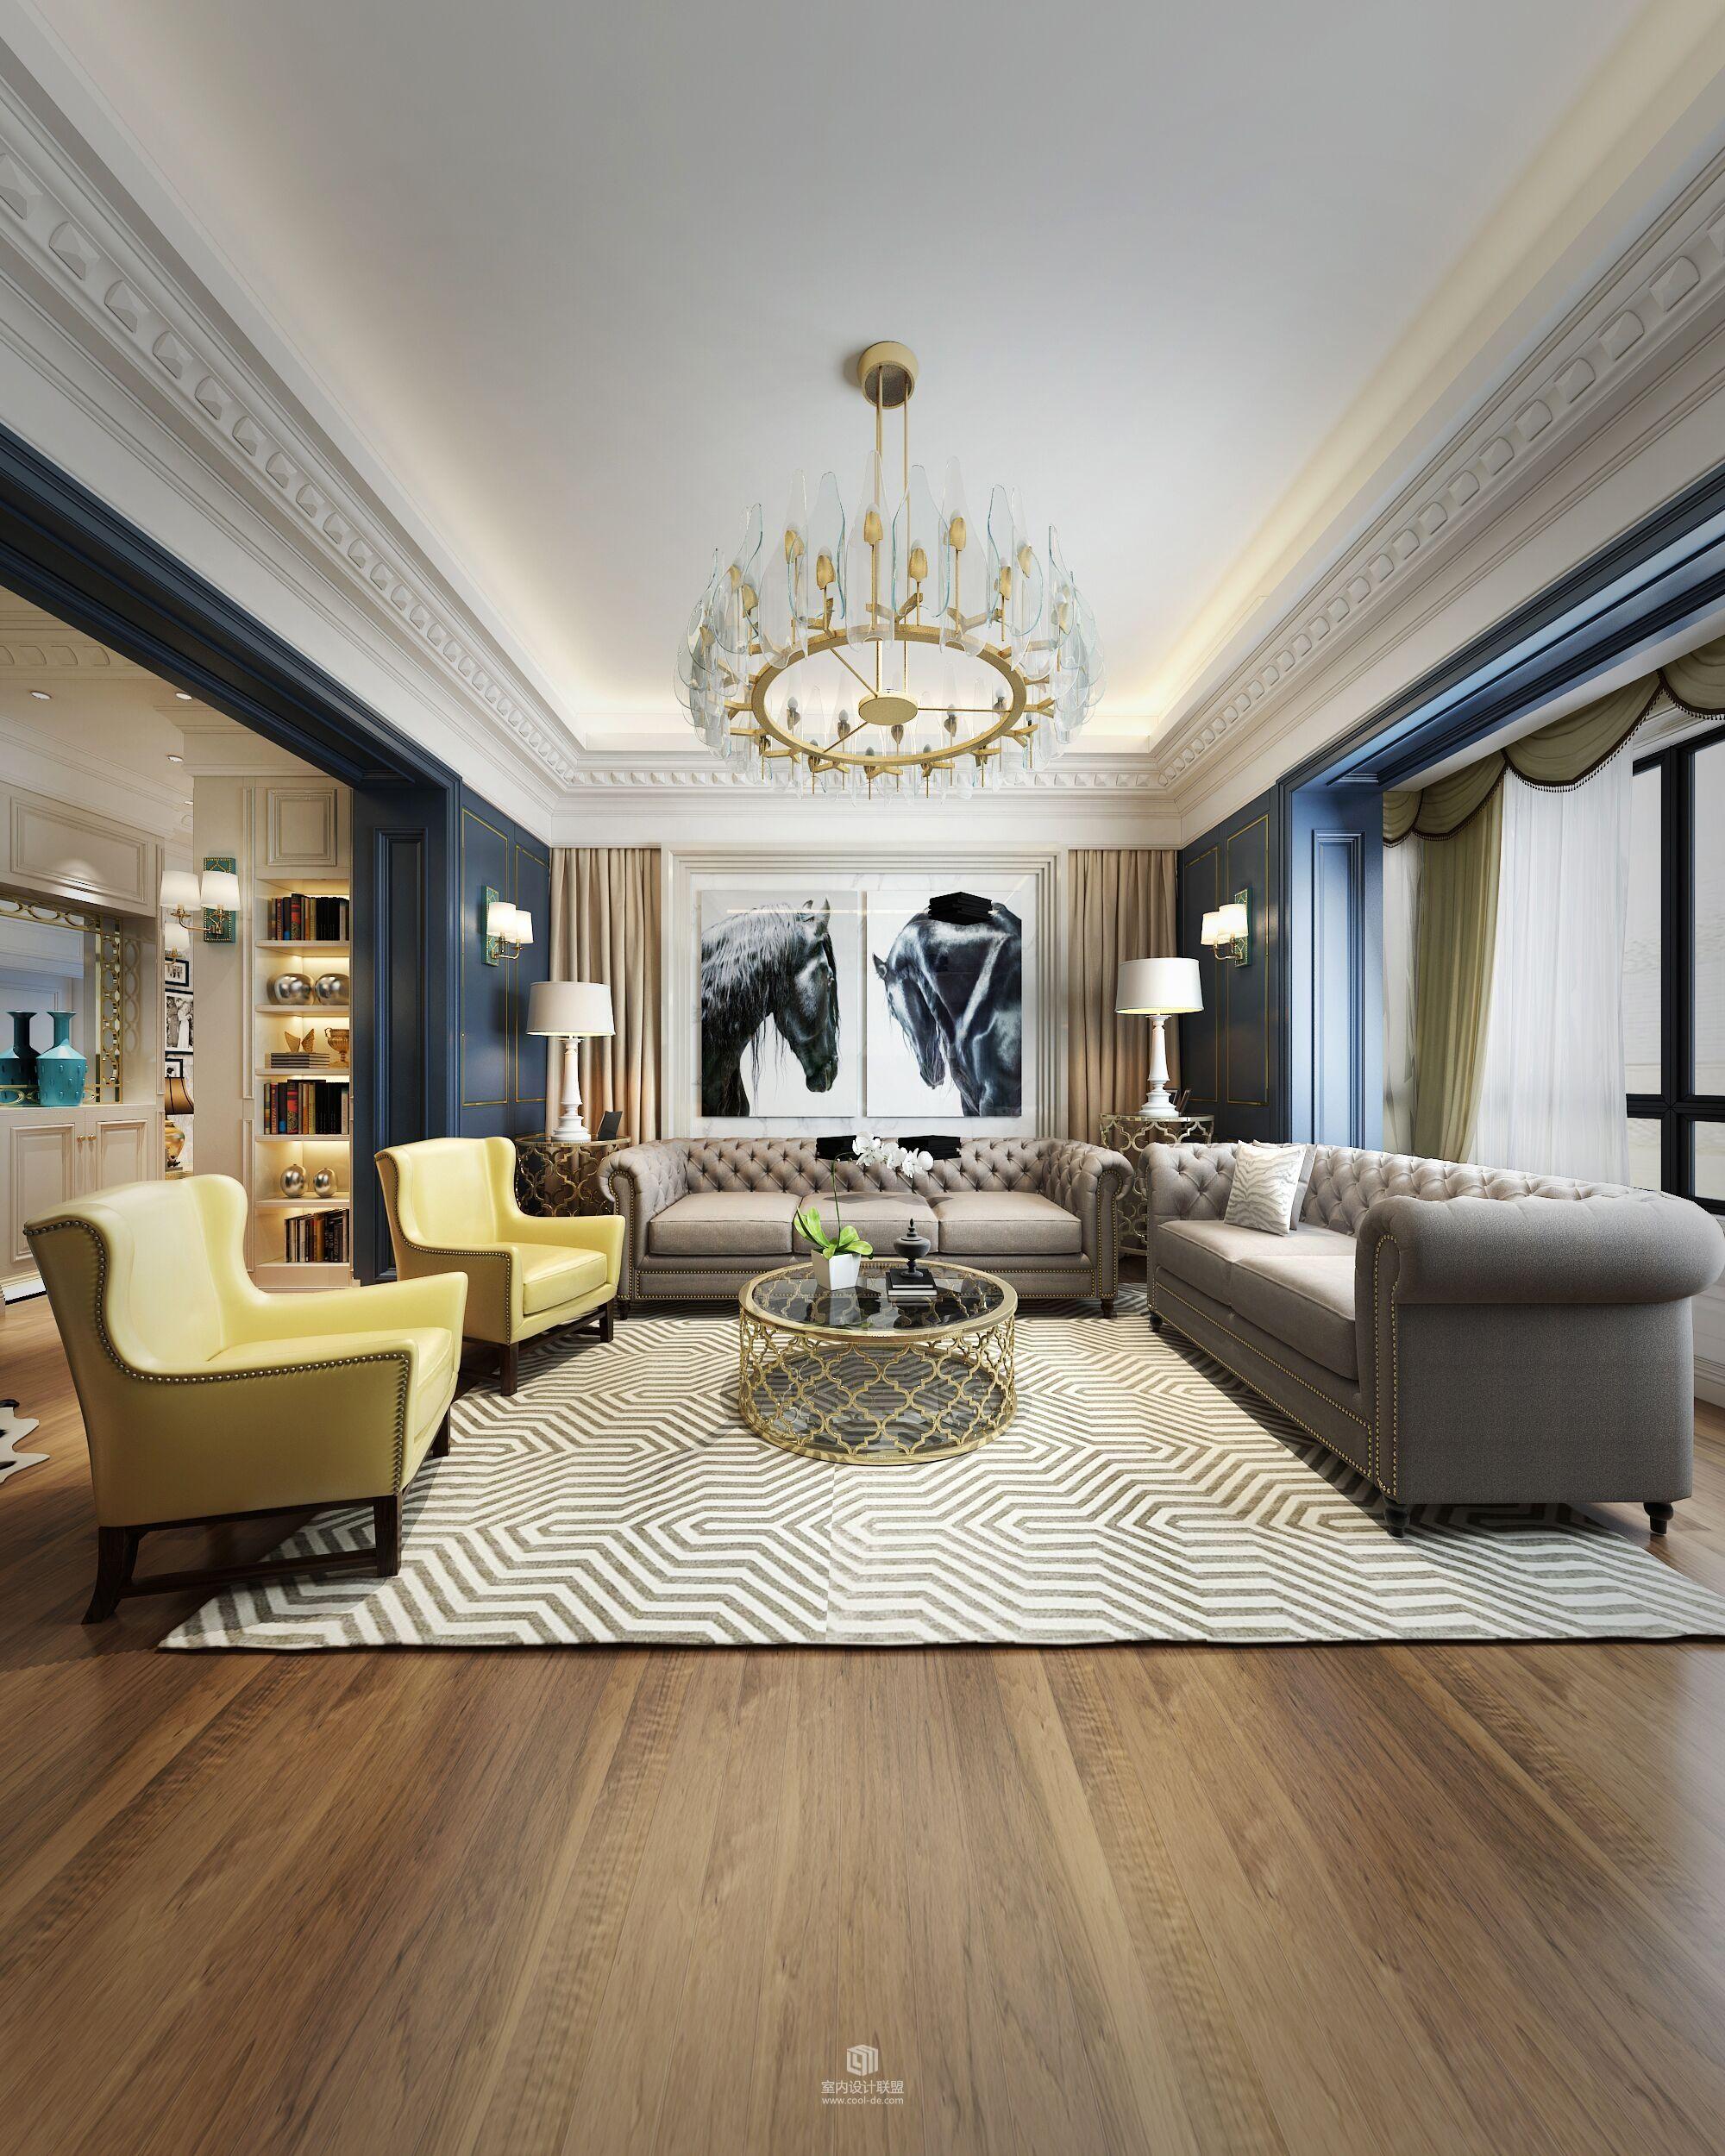 2000 2500 modern classic pinterest wohnzimmer. Black Bedroom Furniture Sets. Home Design Ideas